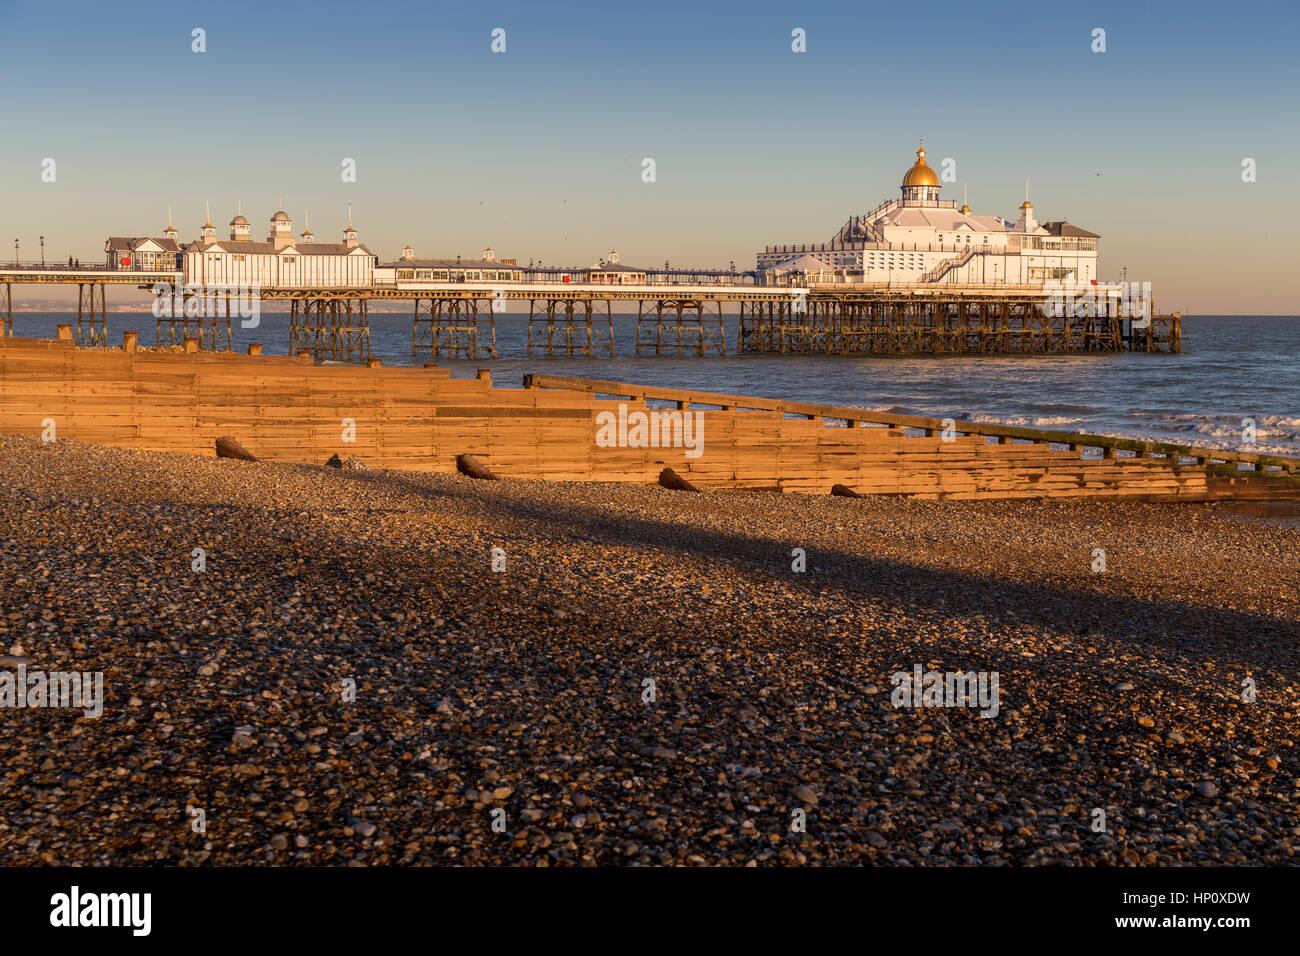 Eastbourne Pier Sussex Golden Dome South Coast British Seaside Resort England UK - Stock Image